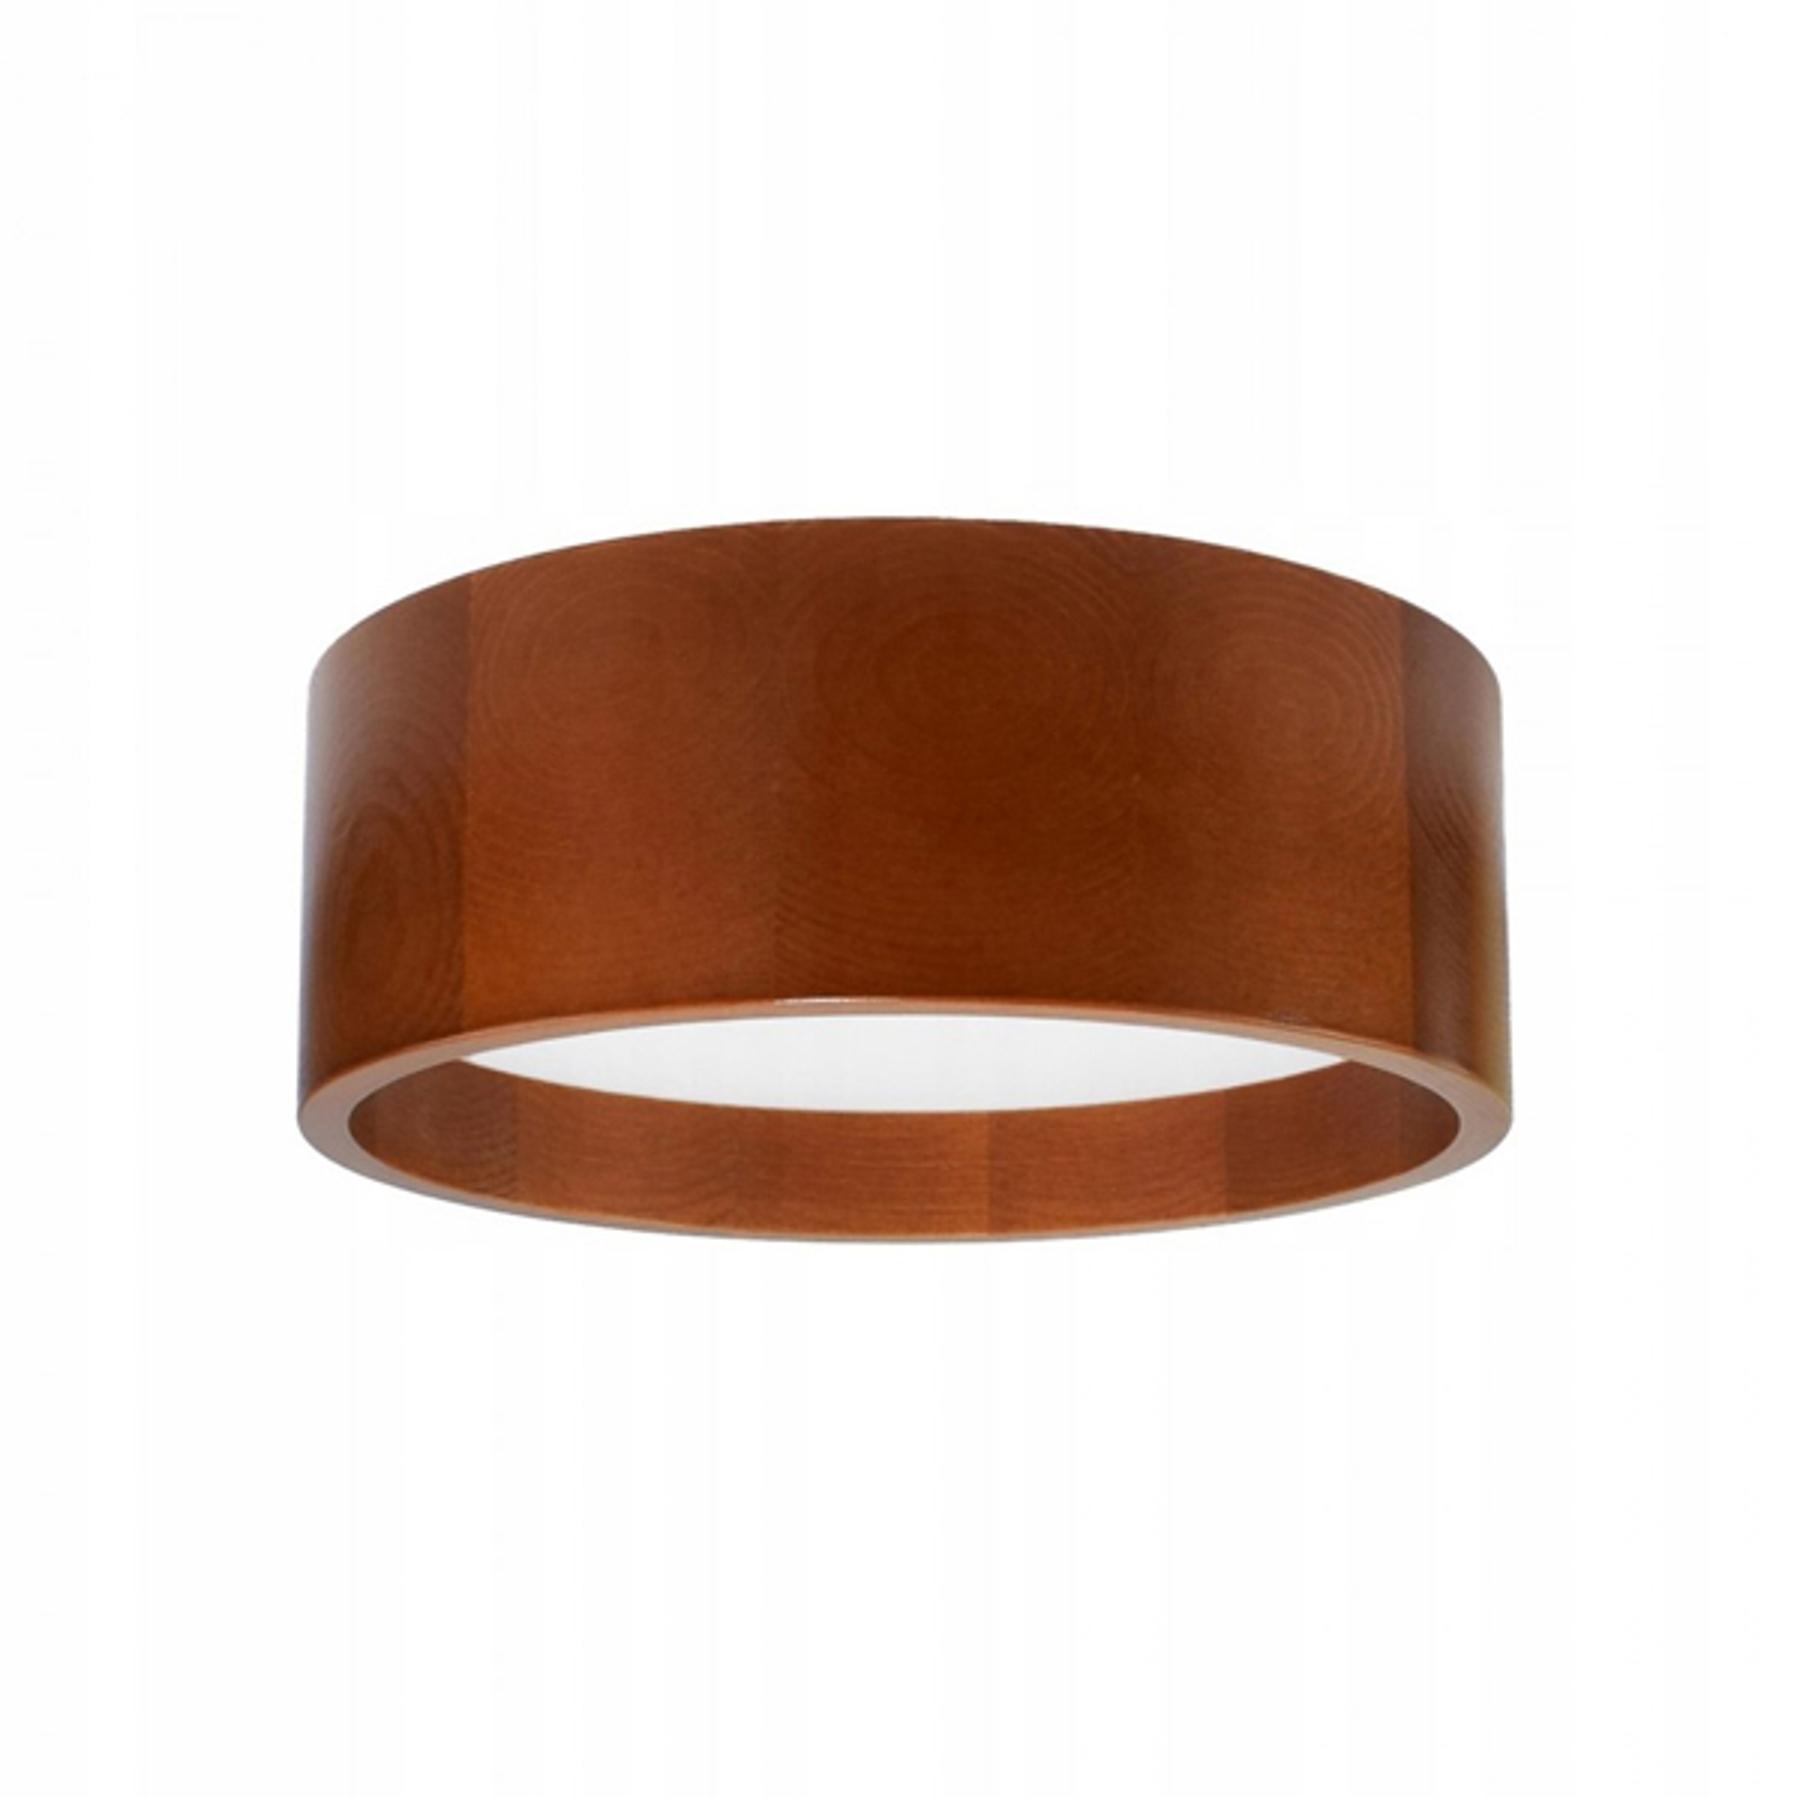 LED-Deckenleuchte Deep, Ø 28 cm, braun